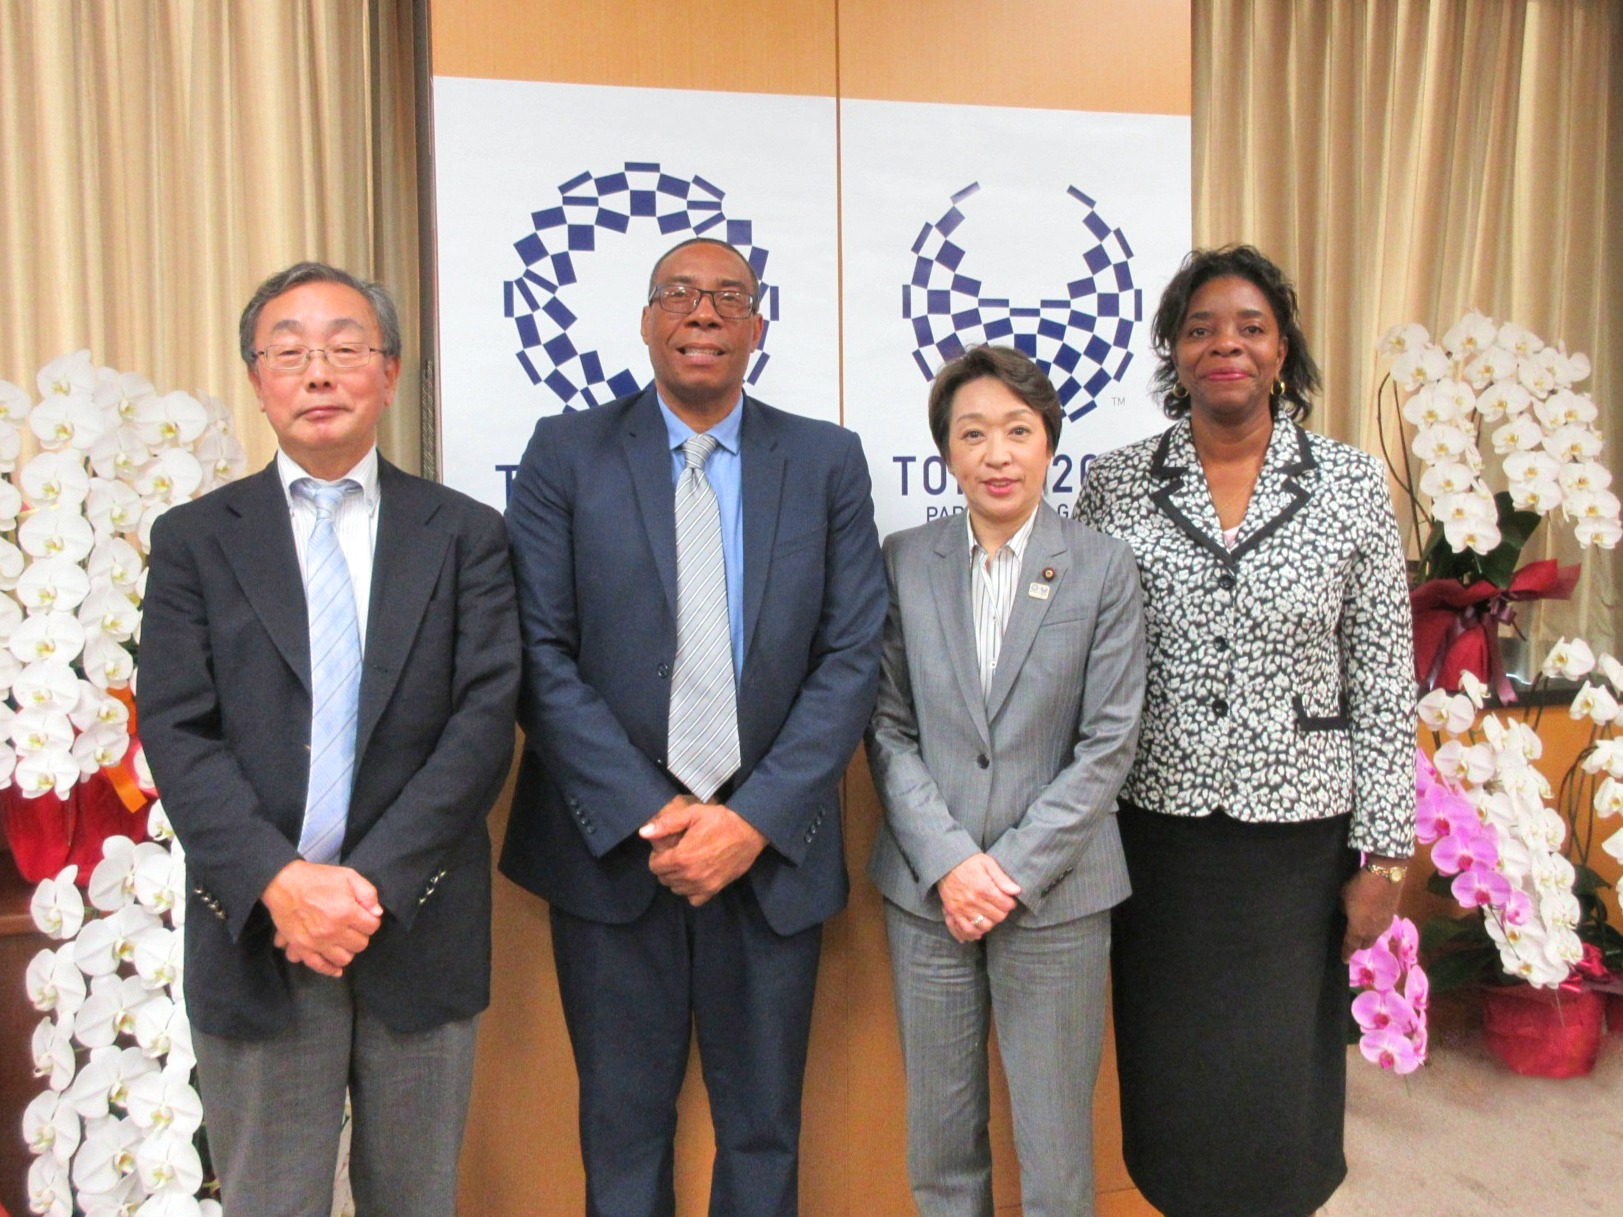 Barbados Minister of Creative Economy, Culture and Sports Invitation Program